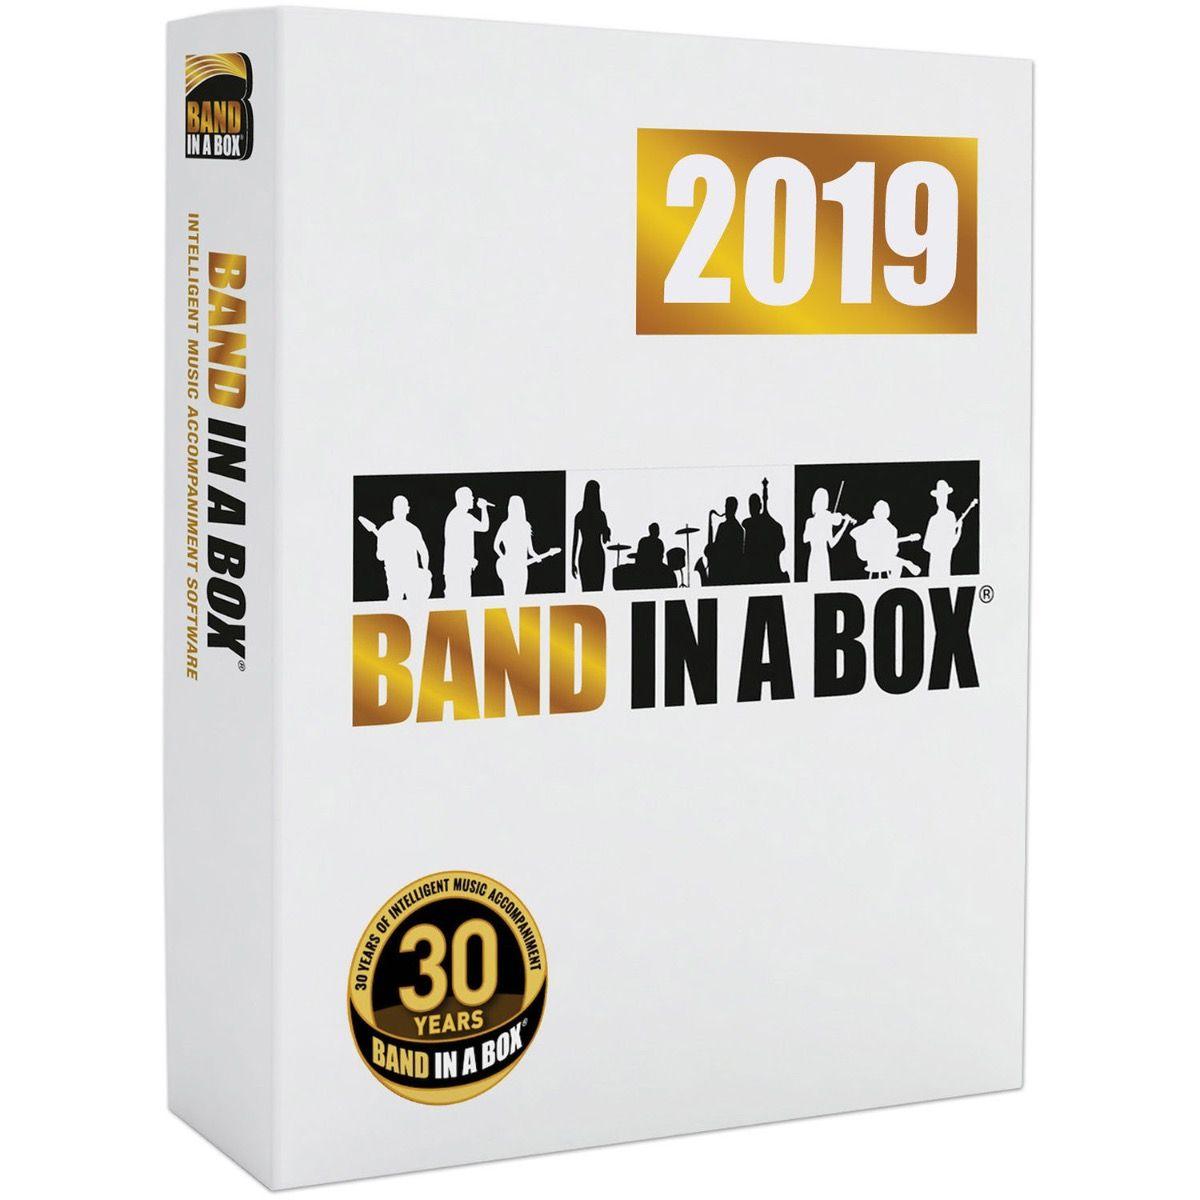 BAND IN A BOX- DARMOWY UPGRADE DO WERSJI 2020 dla WIN